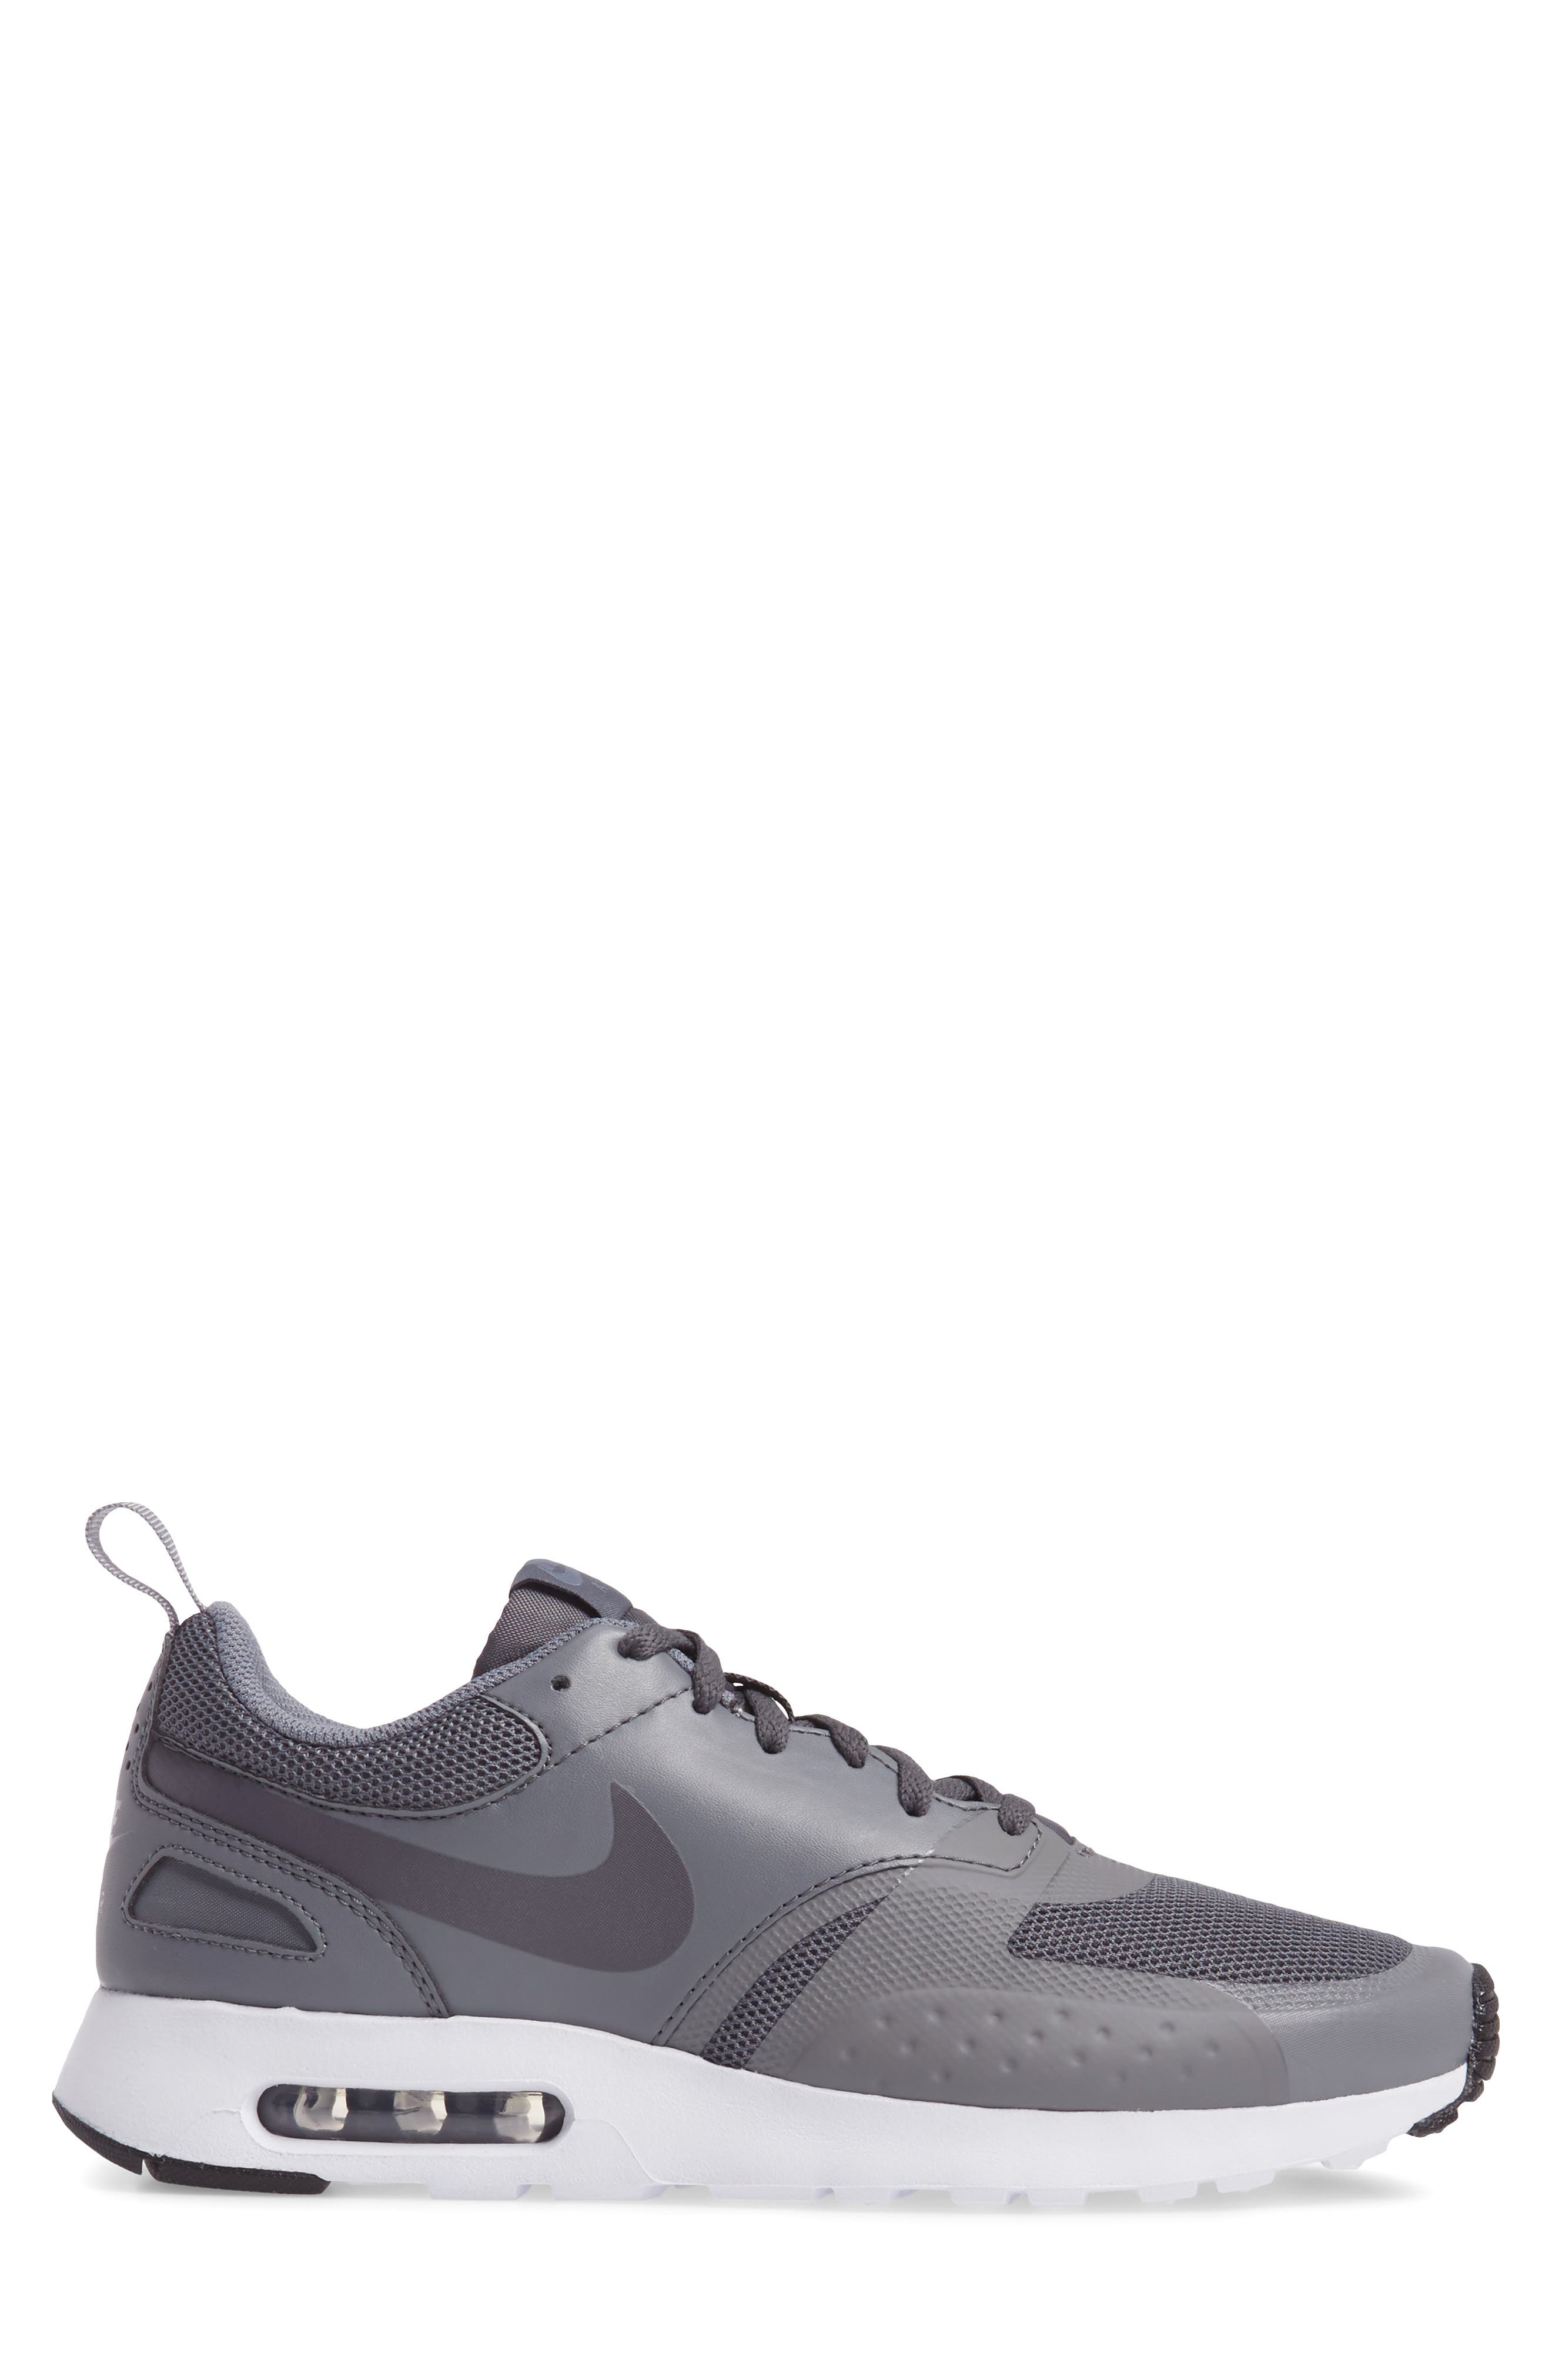 Air Max Vision Sneaker,                             Alternate thumbnail 3, color,                             Cool Grey/ Dark Grey/ White